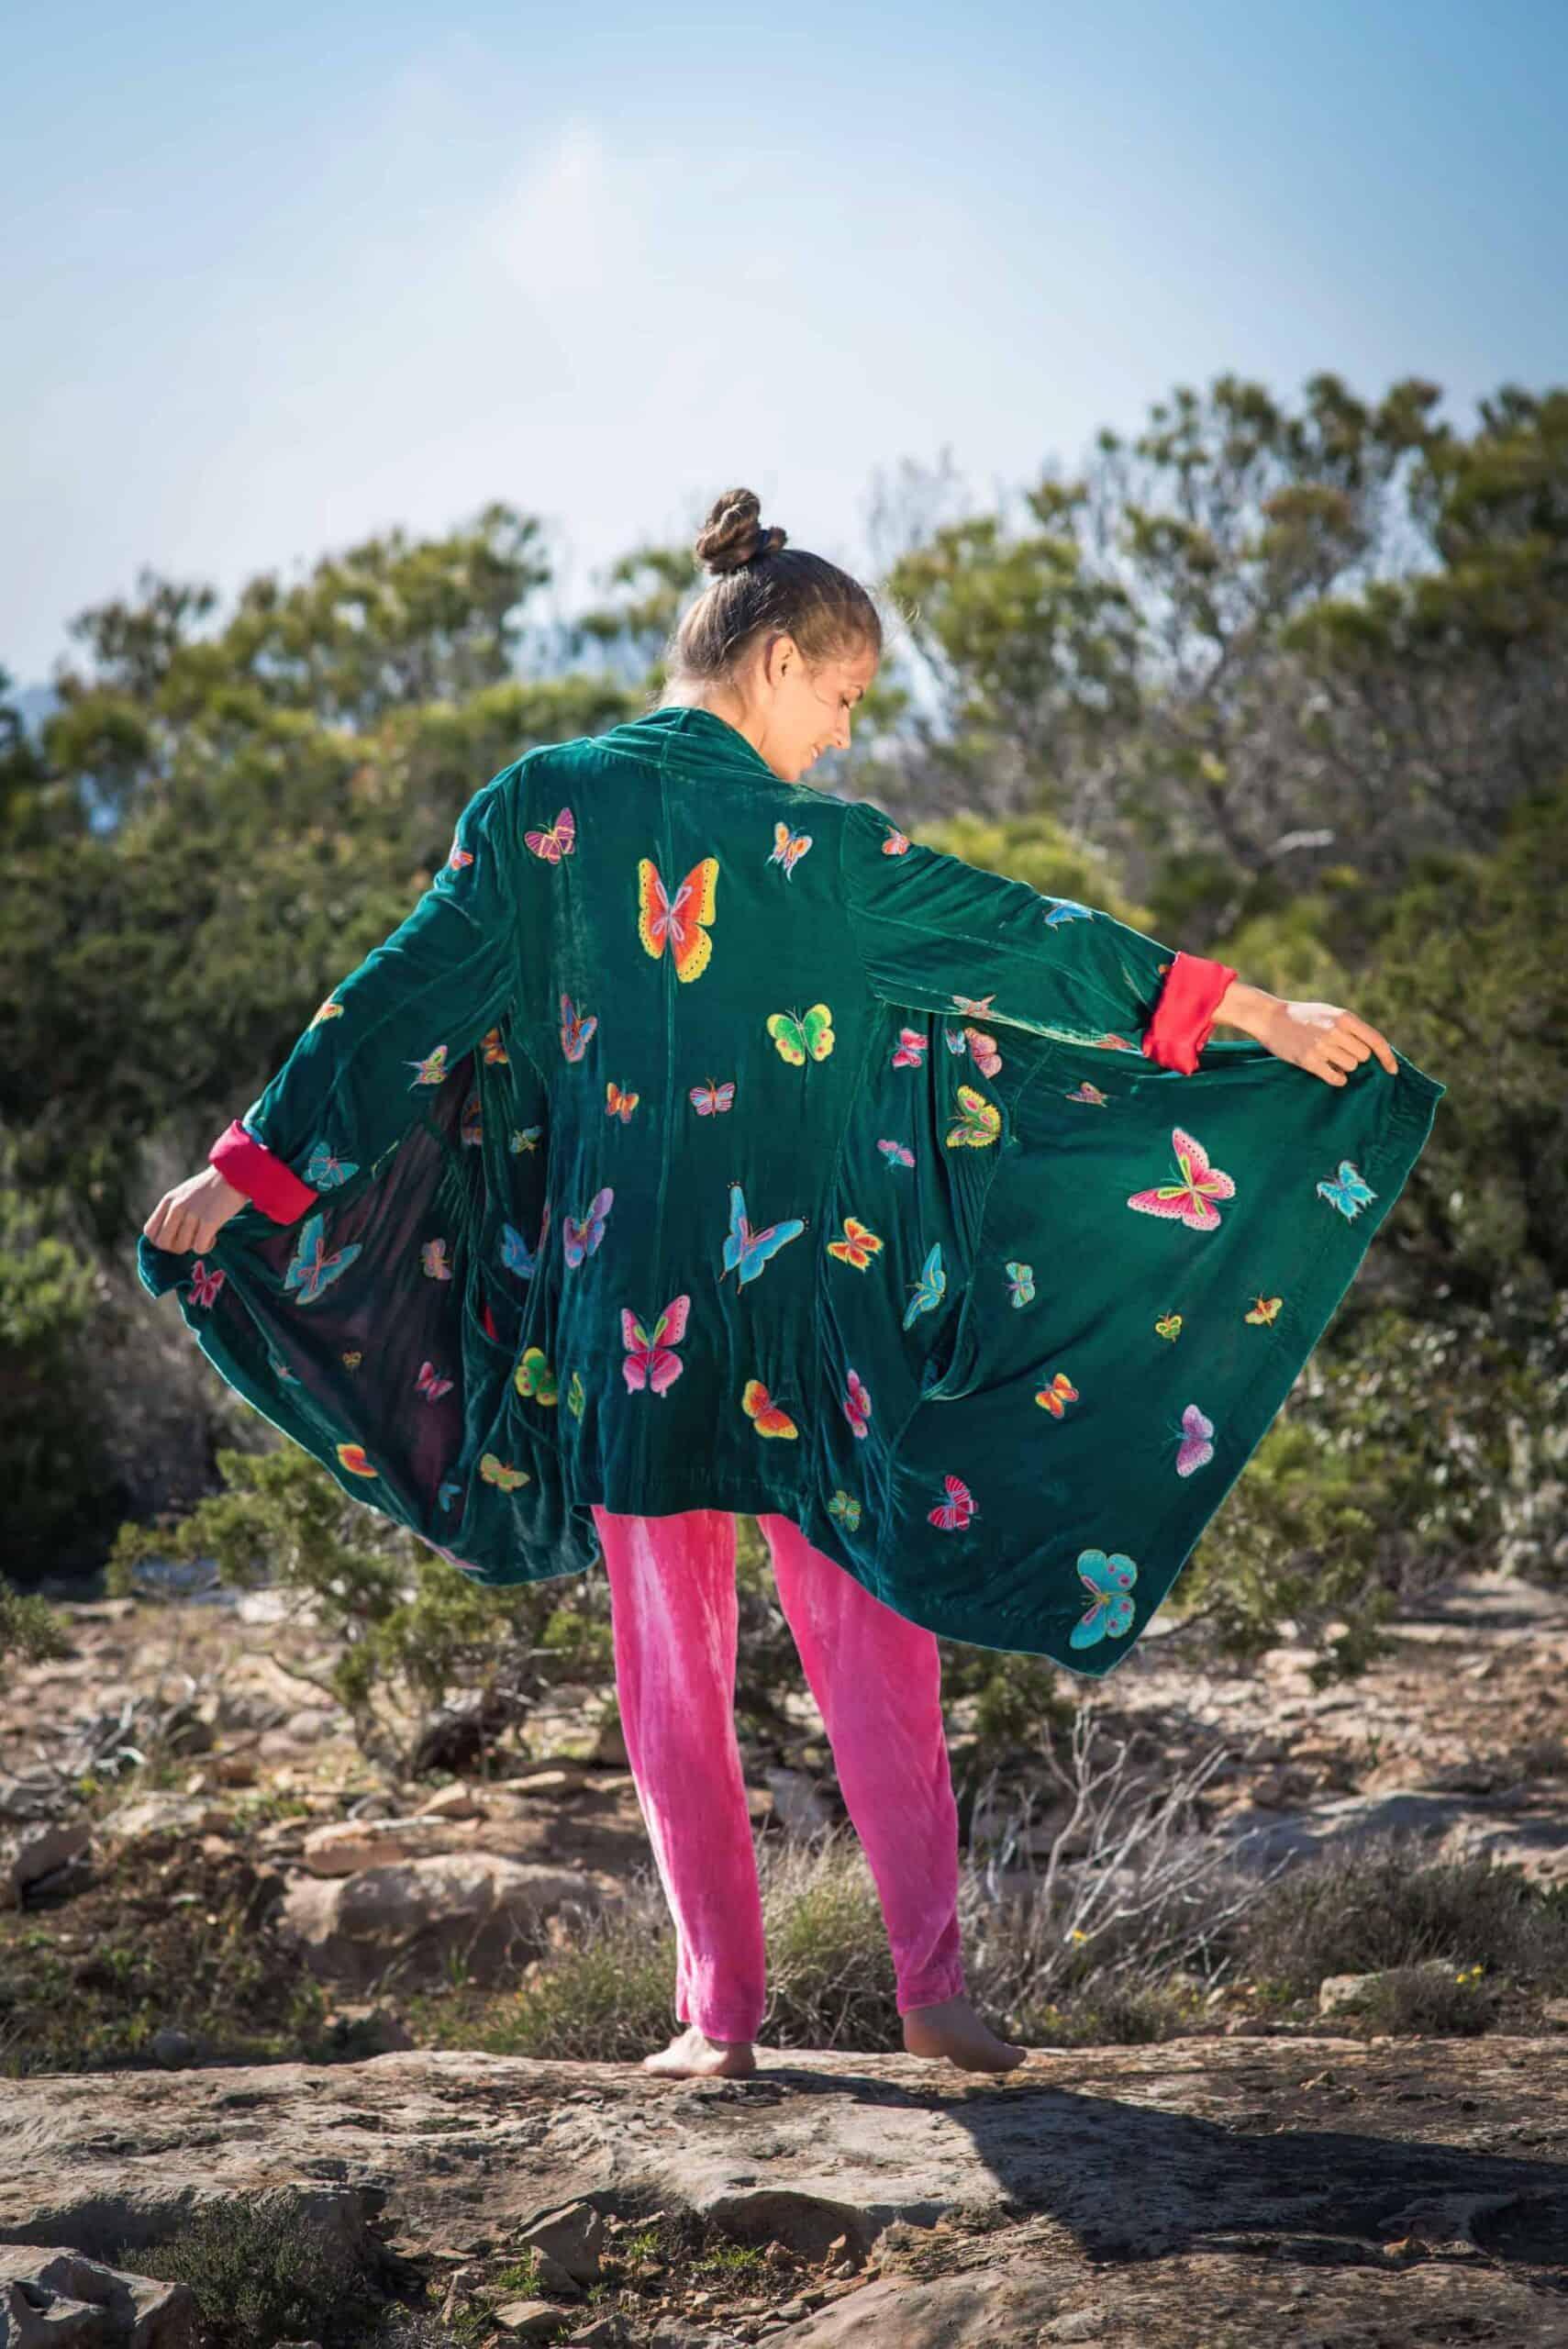 Flying Jacket in Green Velvet La Galeria Elefante Ibiza Victoria Made With Love & Laughter